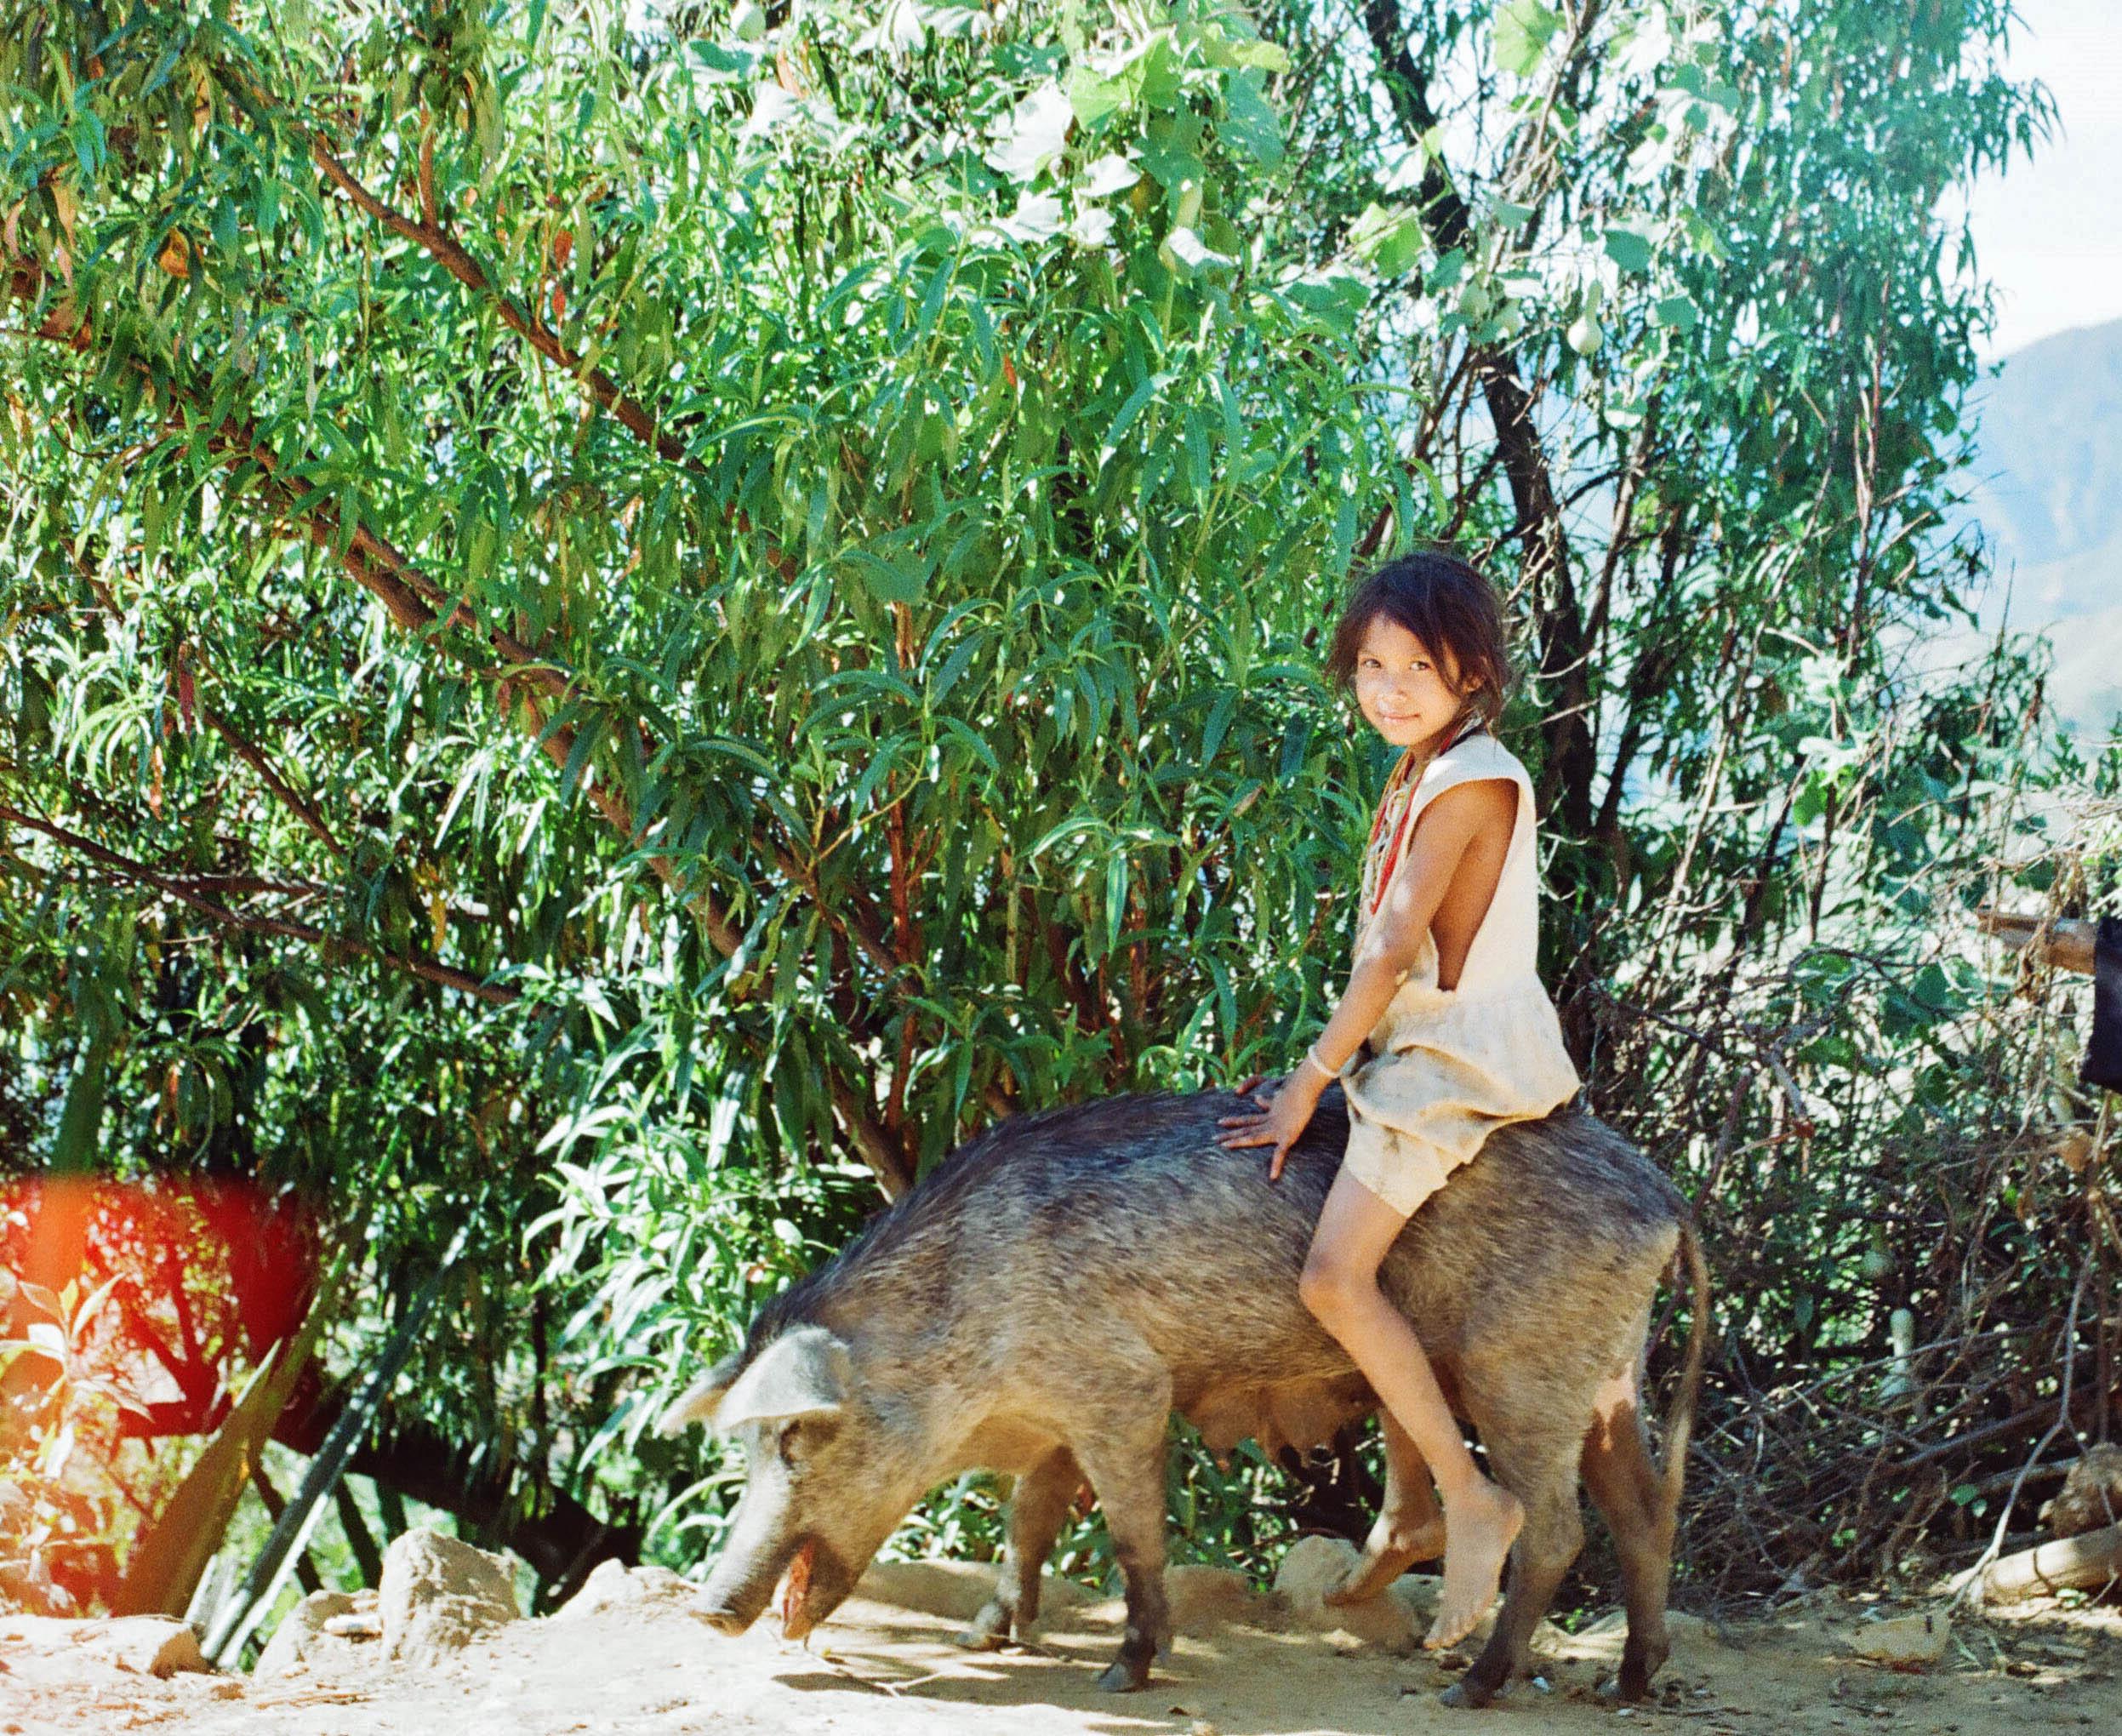 Jinga y puerca negra / Arhuaco girl, from Sierra Nevada de Santa Marta, riding a pig